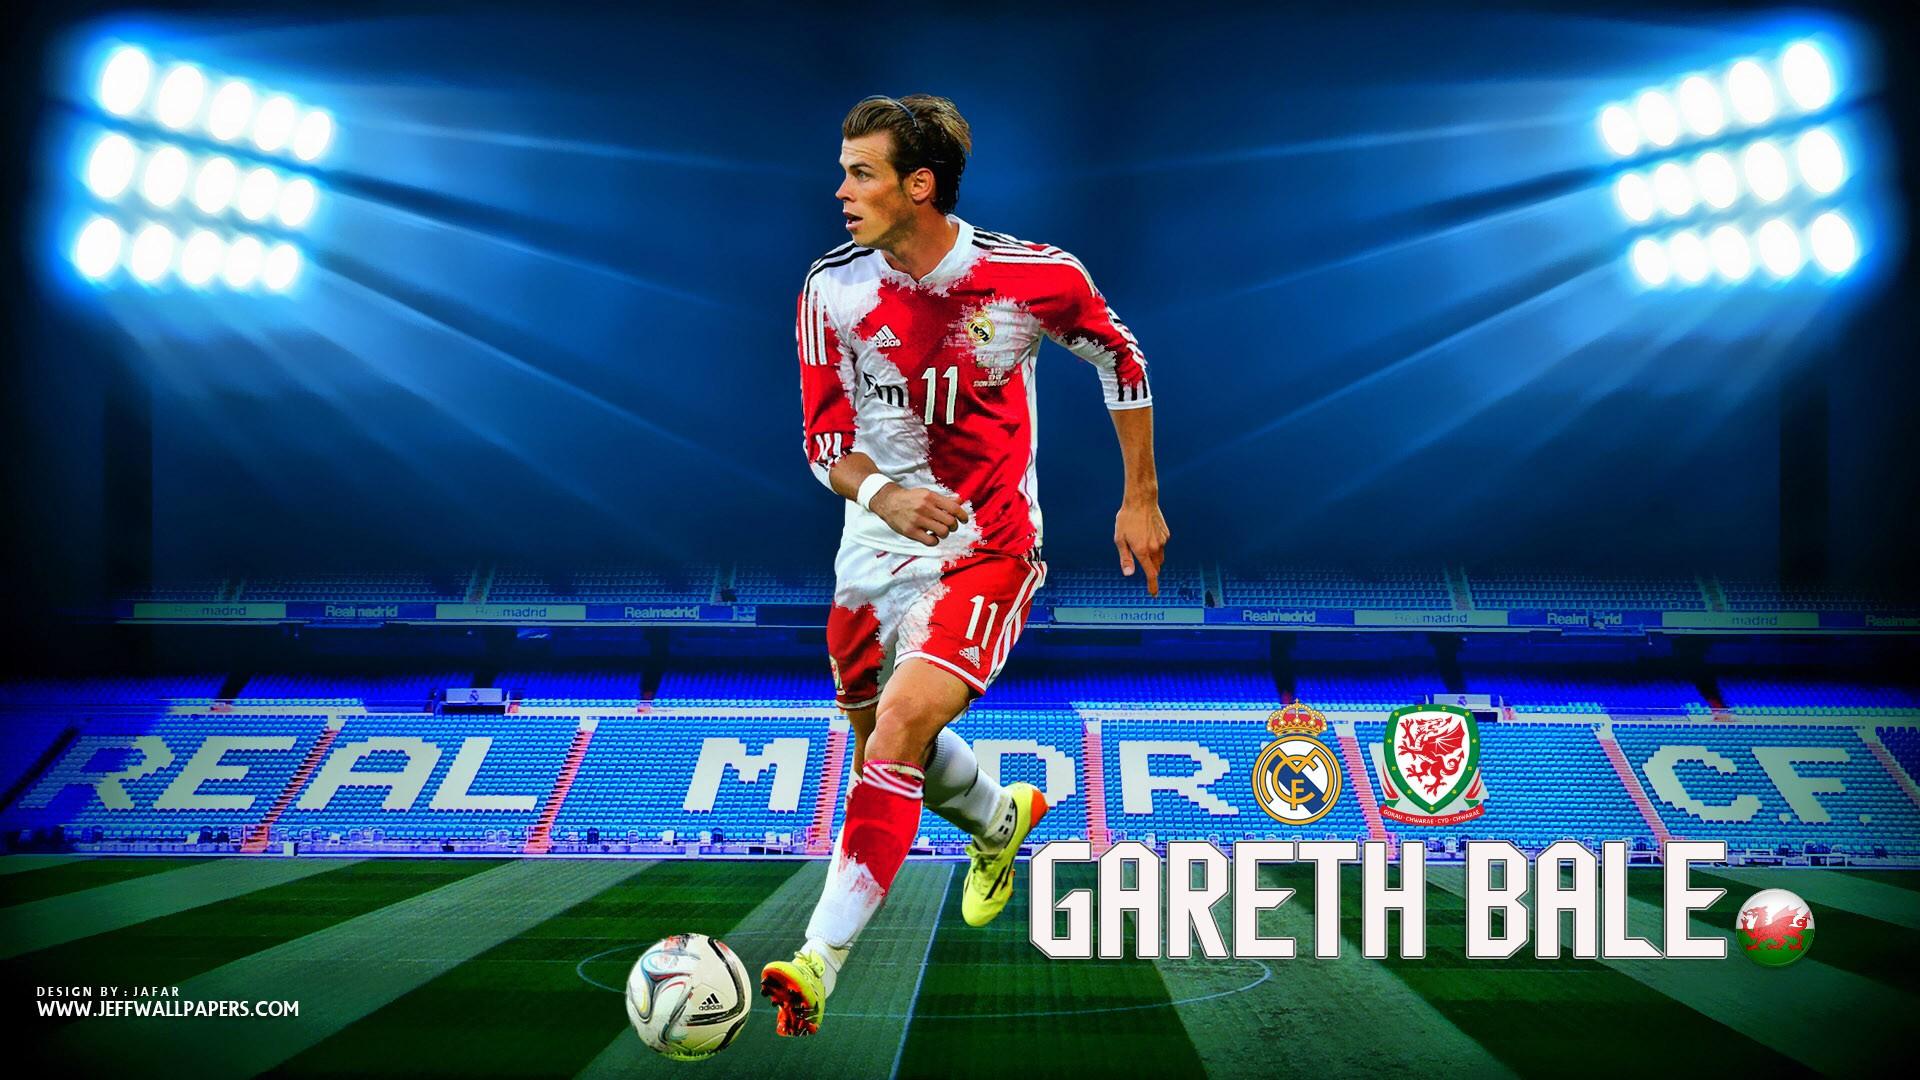 Gareth Bale 2015 Real Madrid Kit HD Wallpaper   StylishHDWallpapers 1920x1080